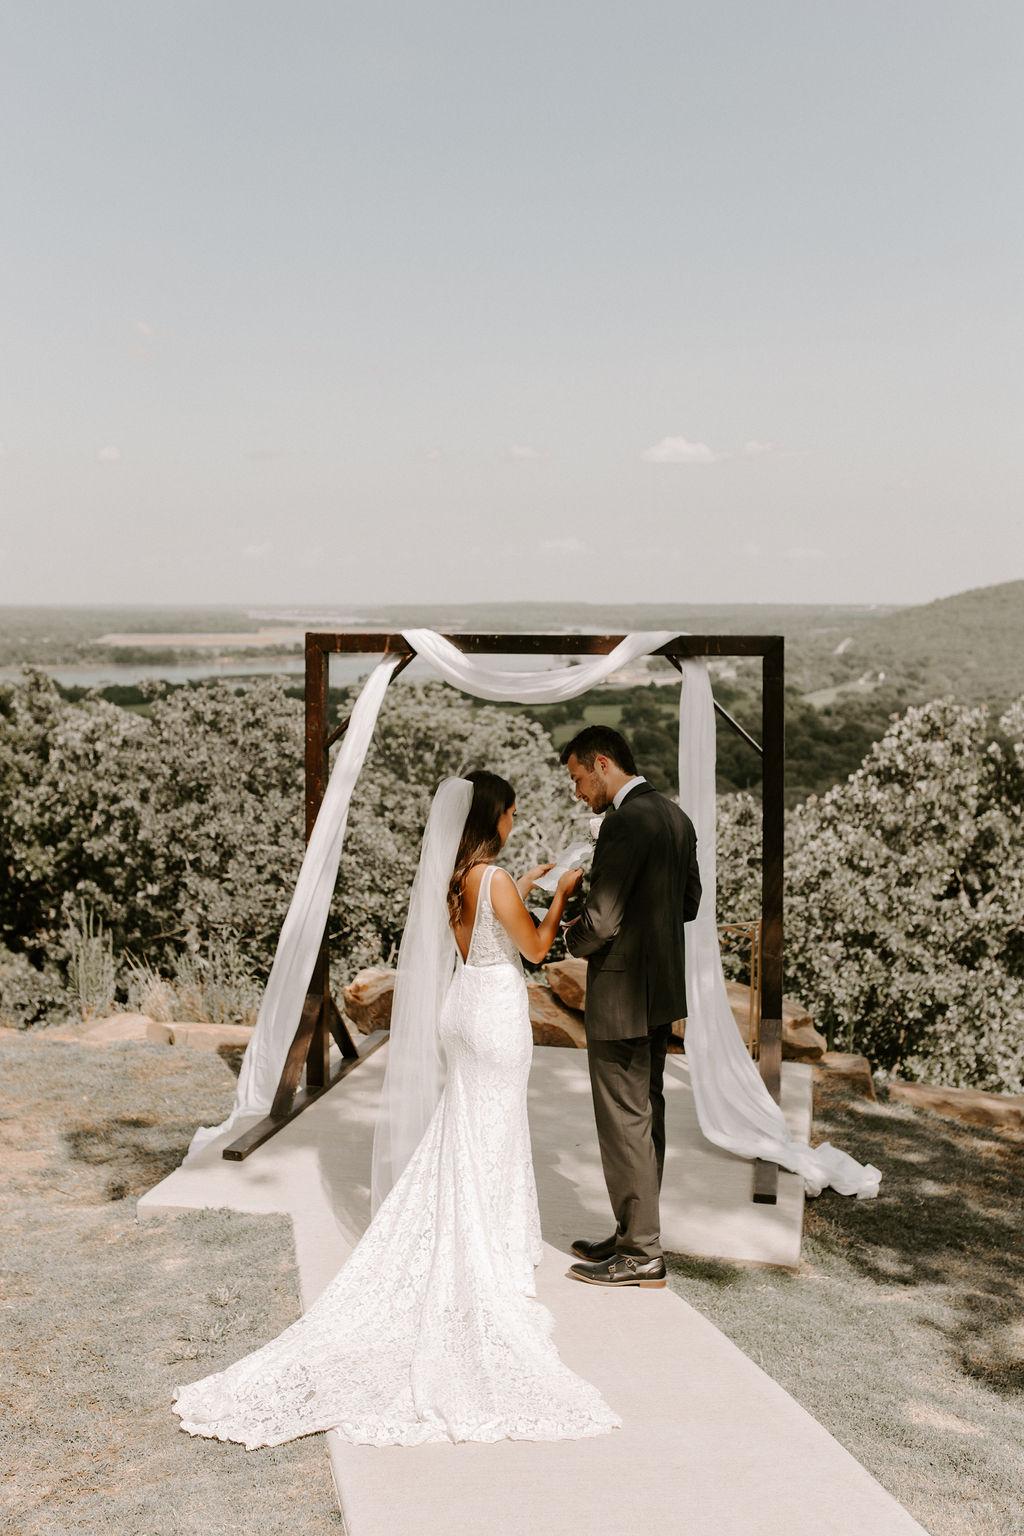 Tulsa White Barn Wedding Venue Outdoor Ceremony 44.jpg